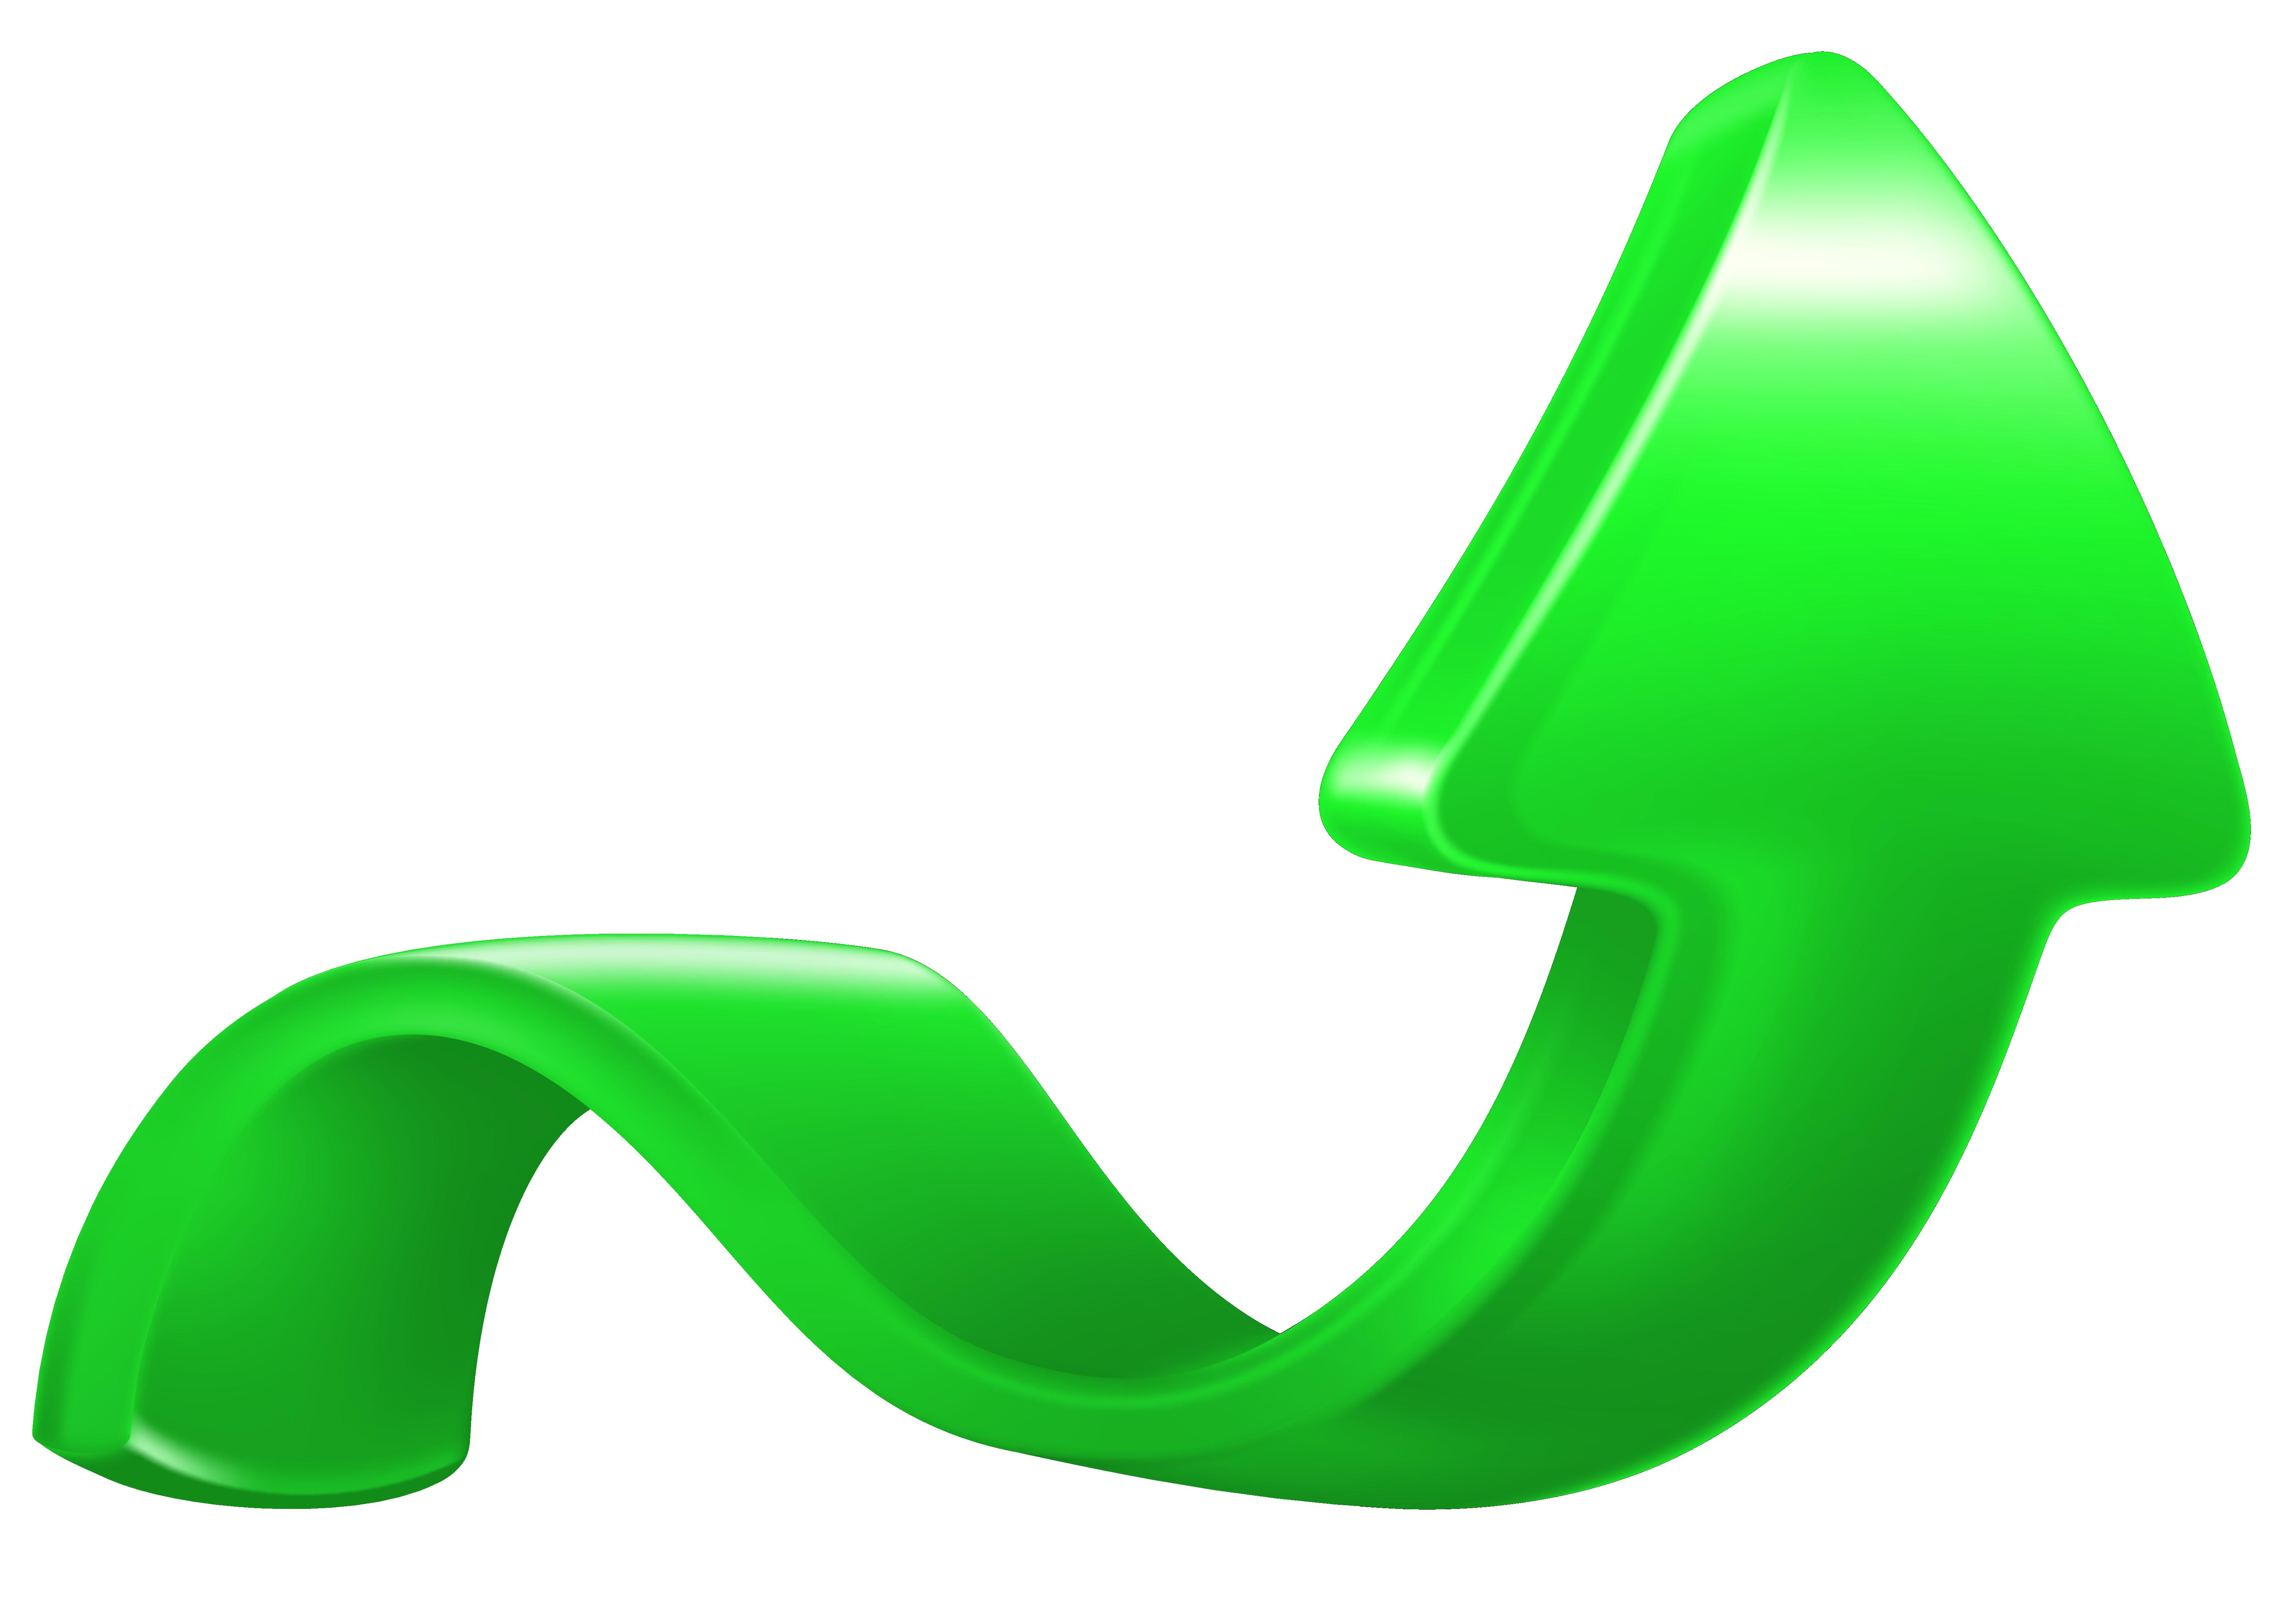 Increase Arrow Green PNG Clip Art Image.